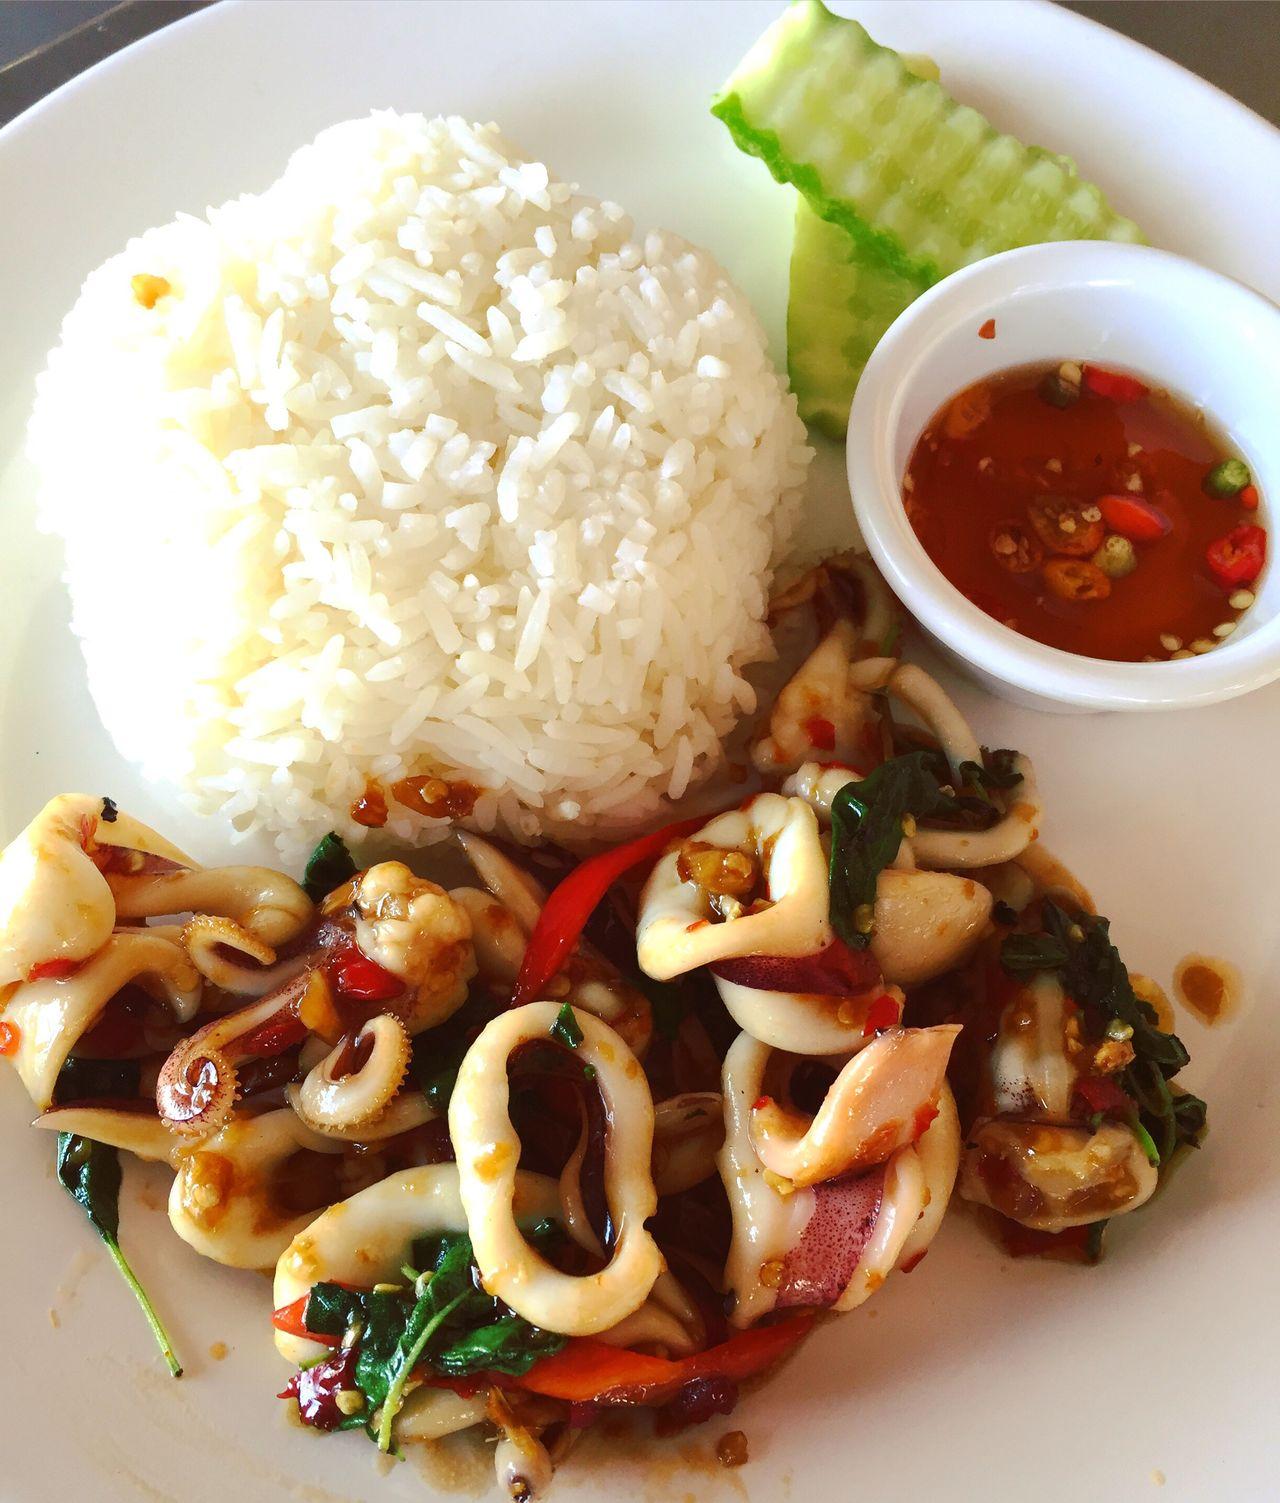 Yummy Delicious Foodporn Foodstagram Foodphotography Food Yummyinmytummy Tasty Foodoftheday Spicy Food Thaistyle Thai Food Squid Stirfriedinhotbasil Todiefor LetsEat Hotandspicy MadetoOrder